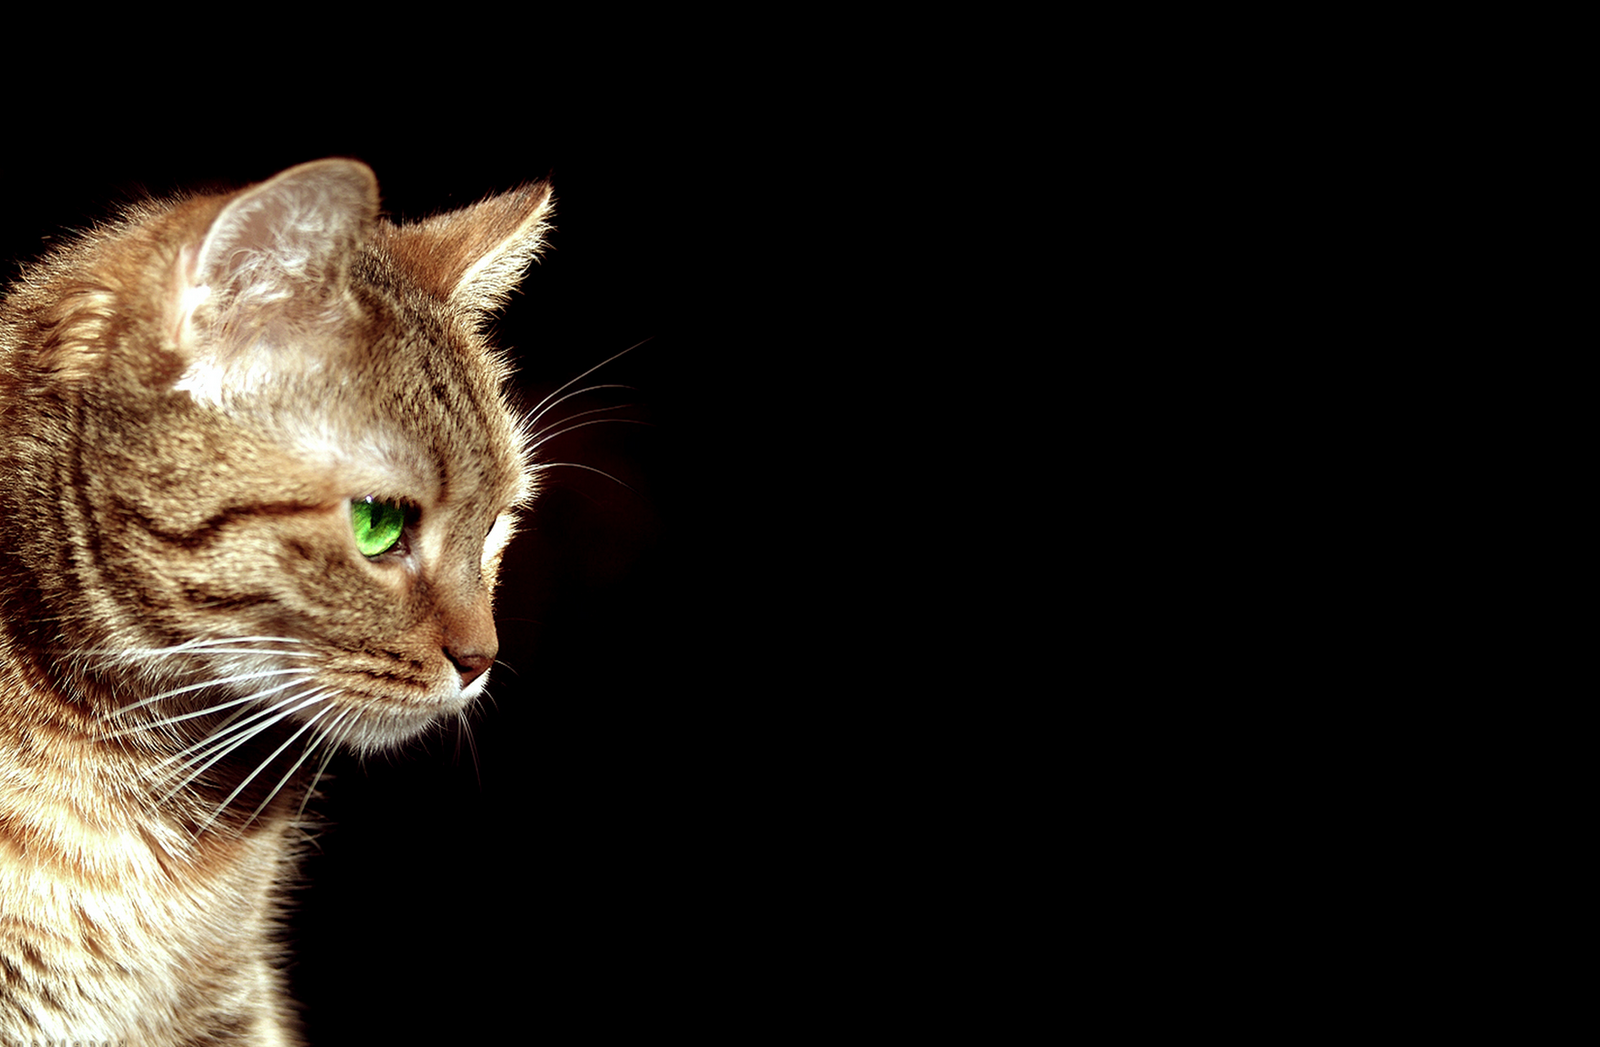 cute cat for 1440x900 - photo #34